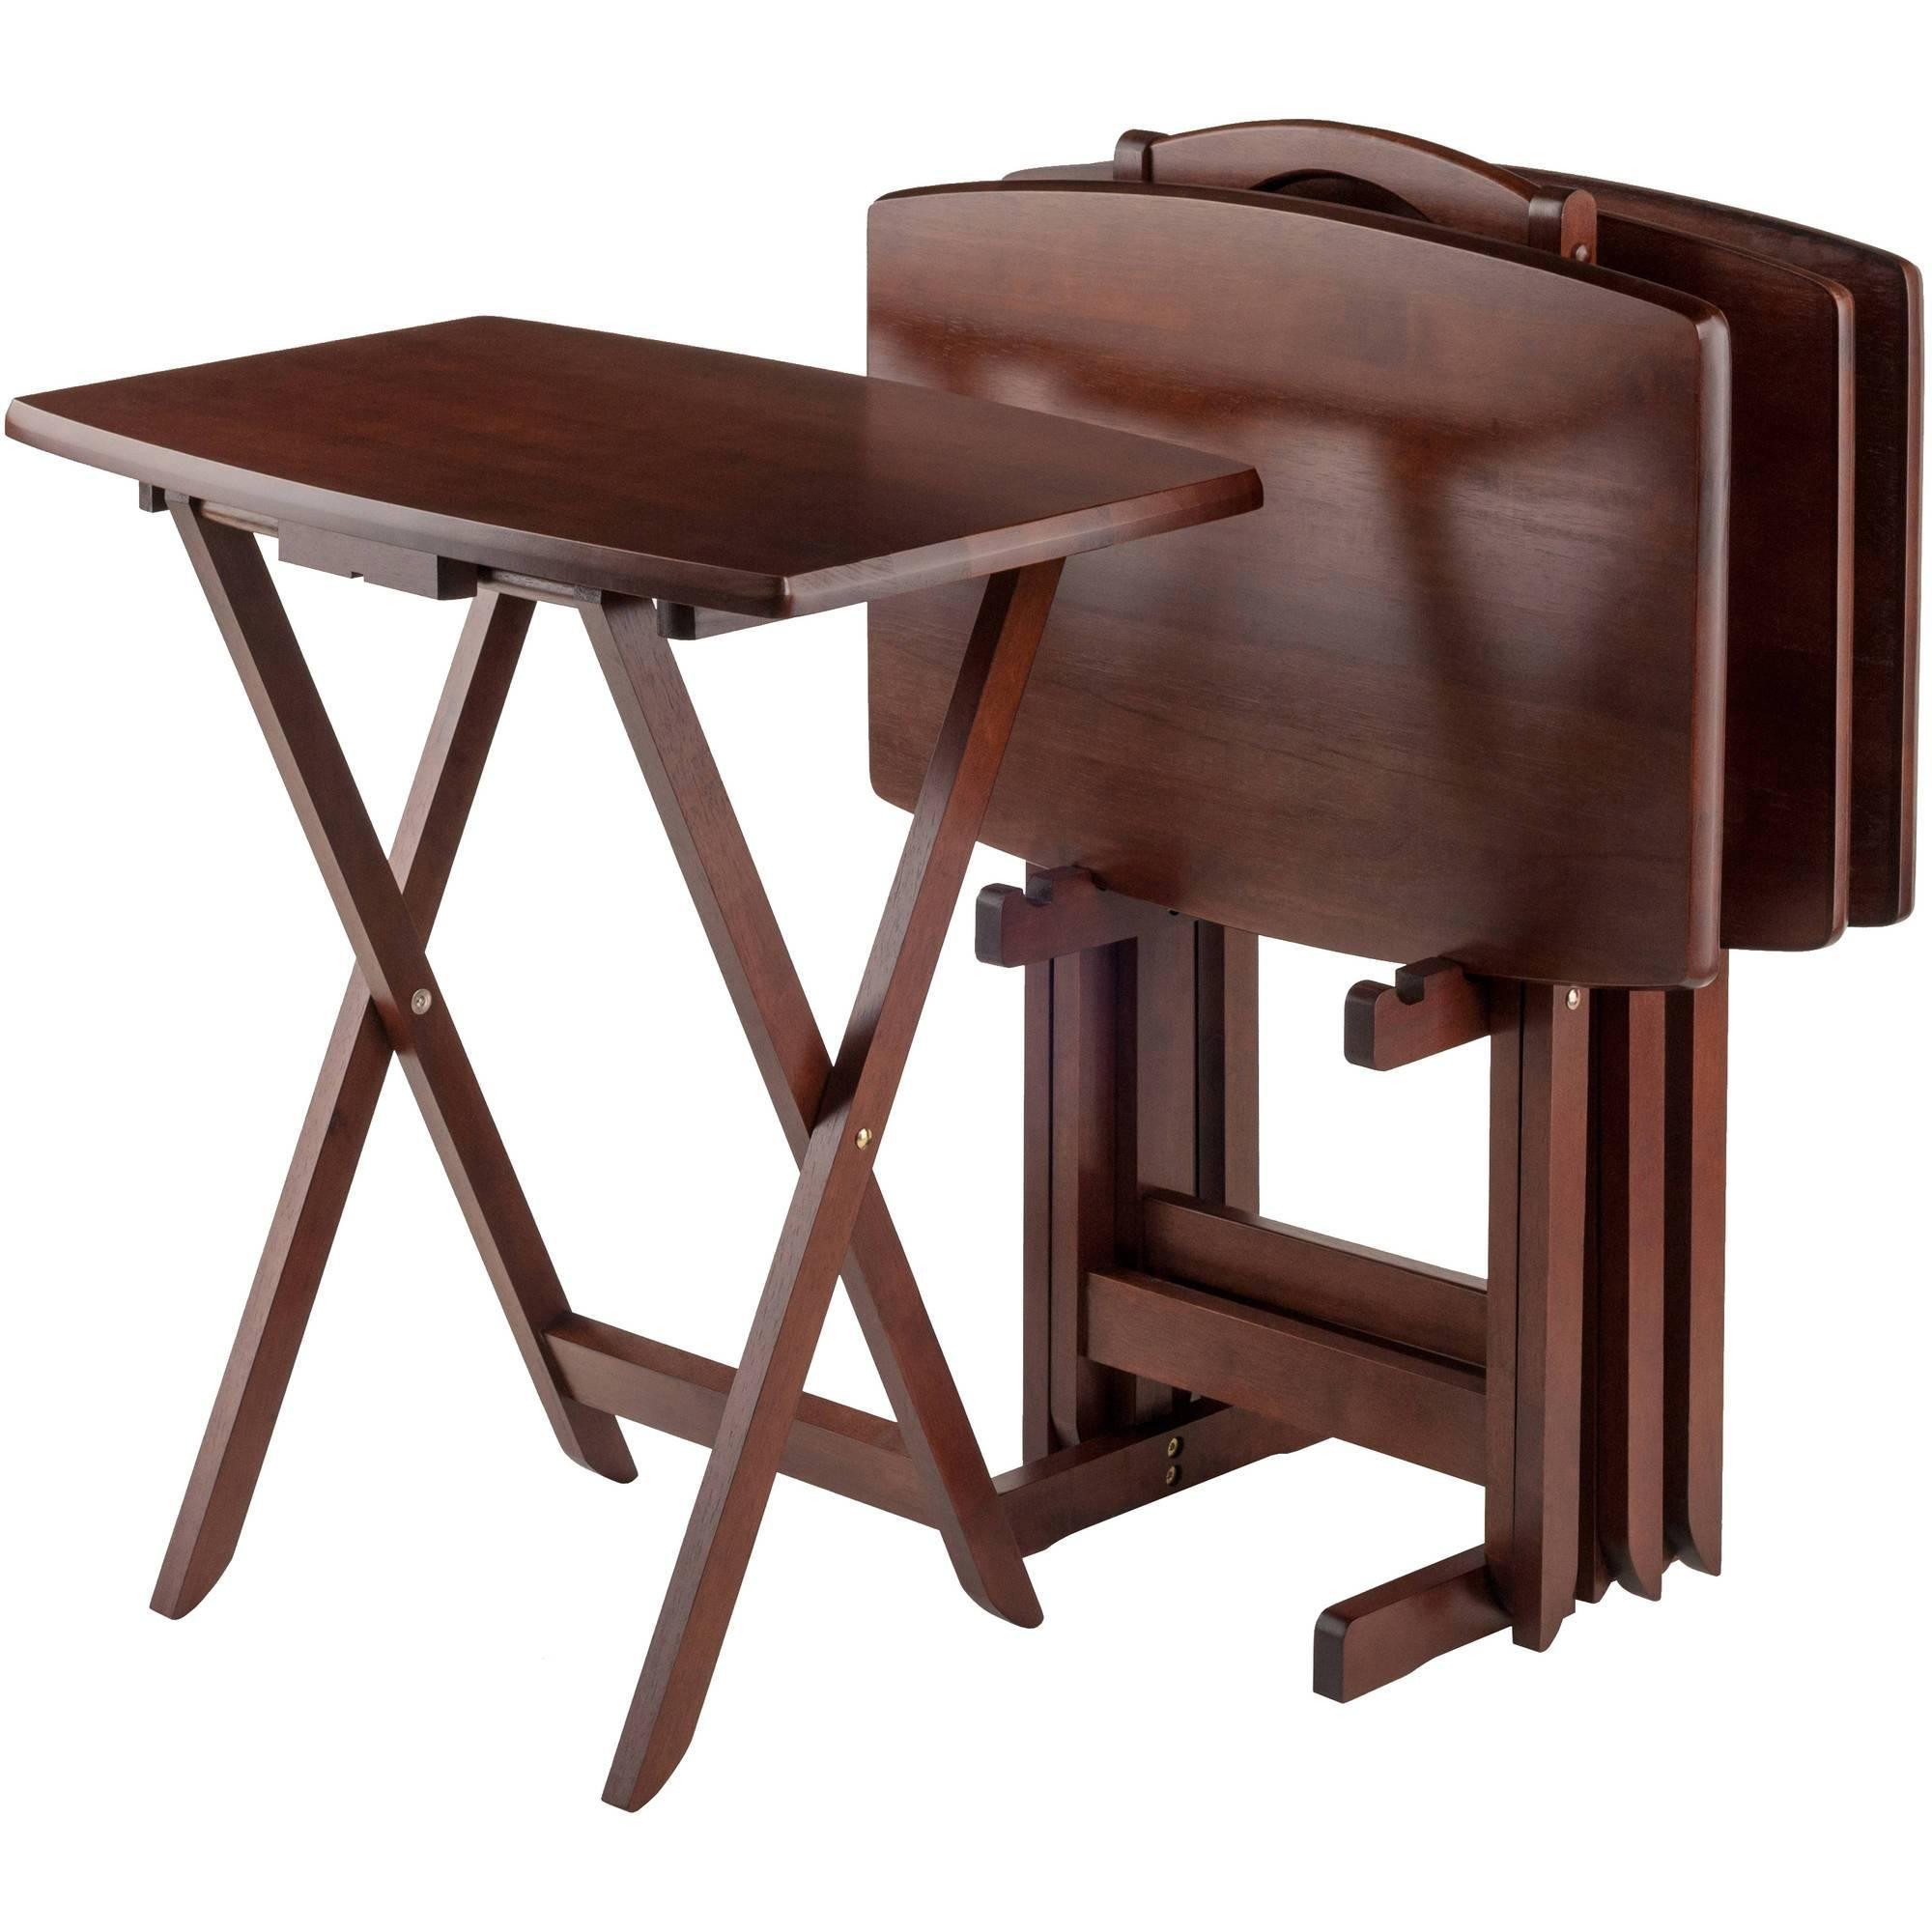 Mainstays Tray Table, Walnut – Walmart For Sofa Snack Tray Table (View 10 of 30)